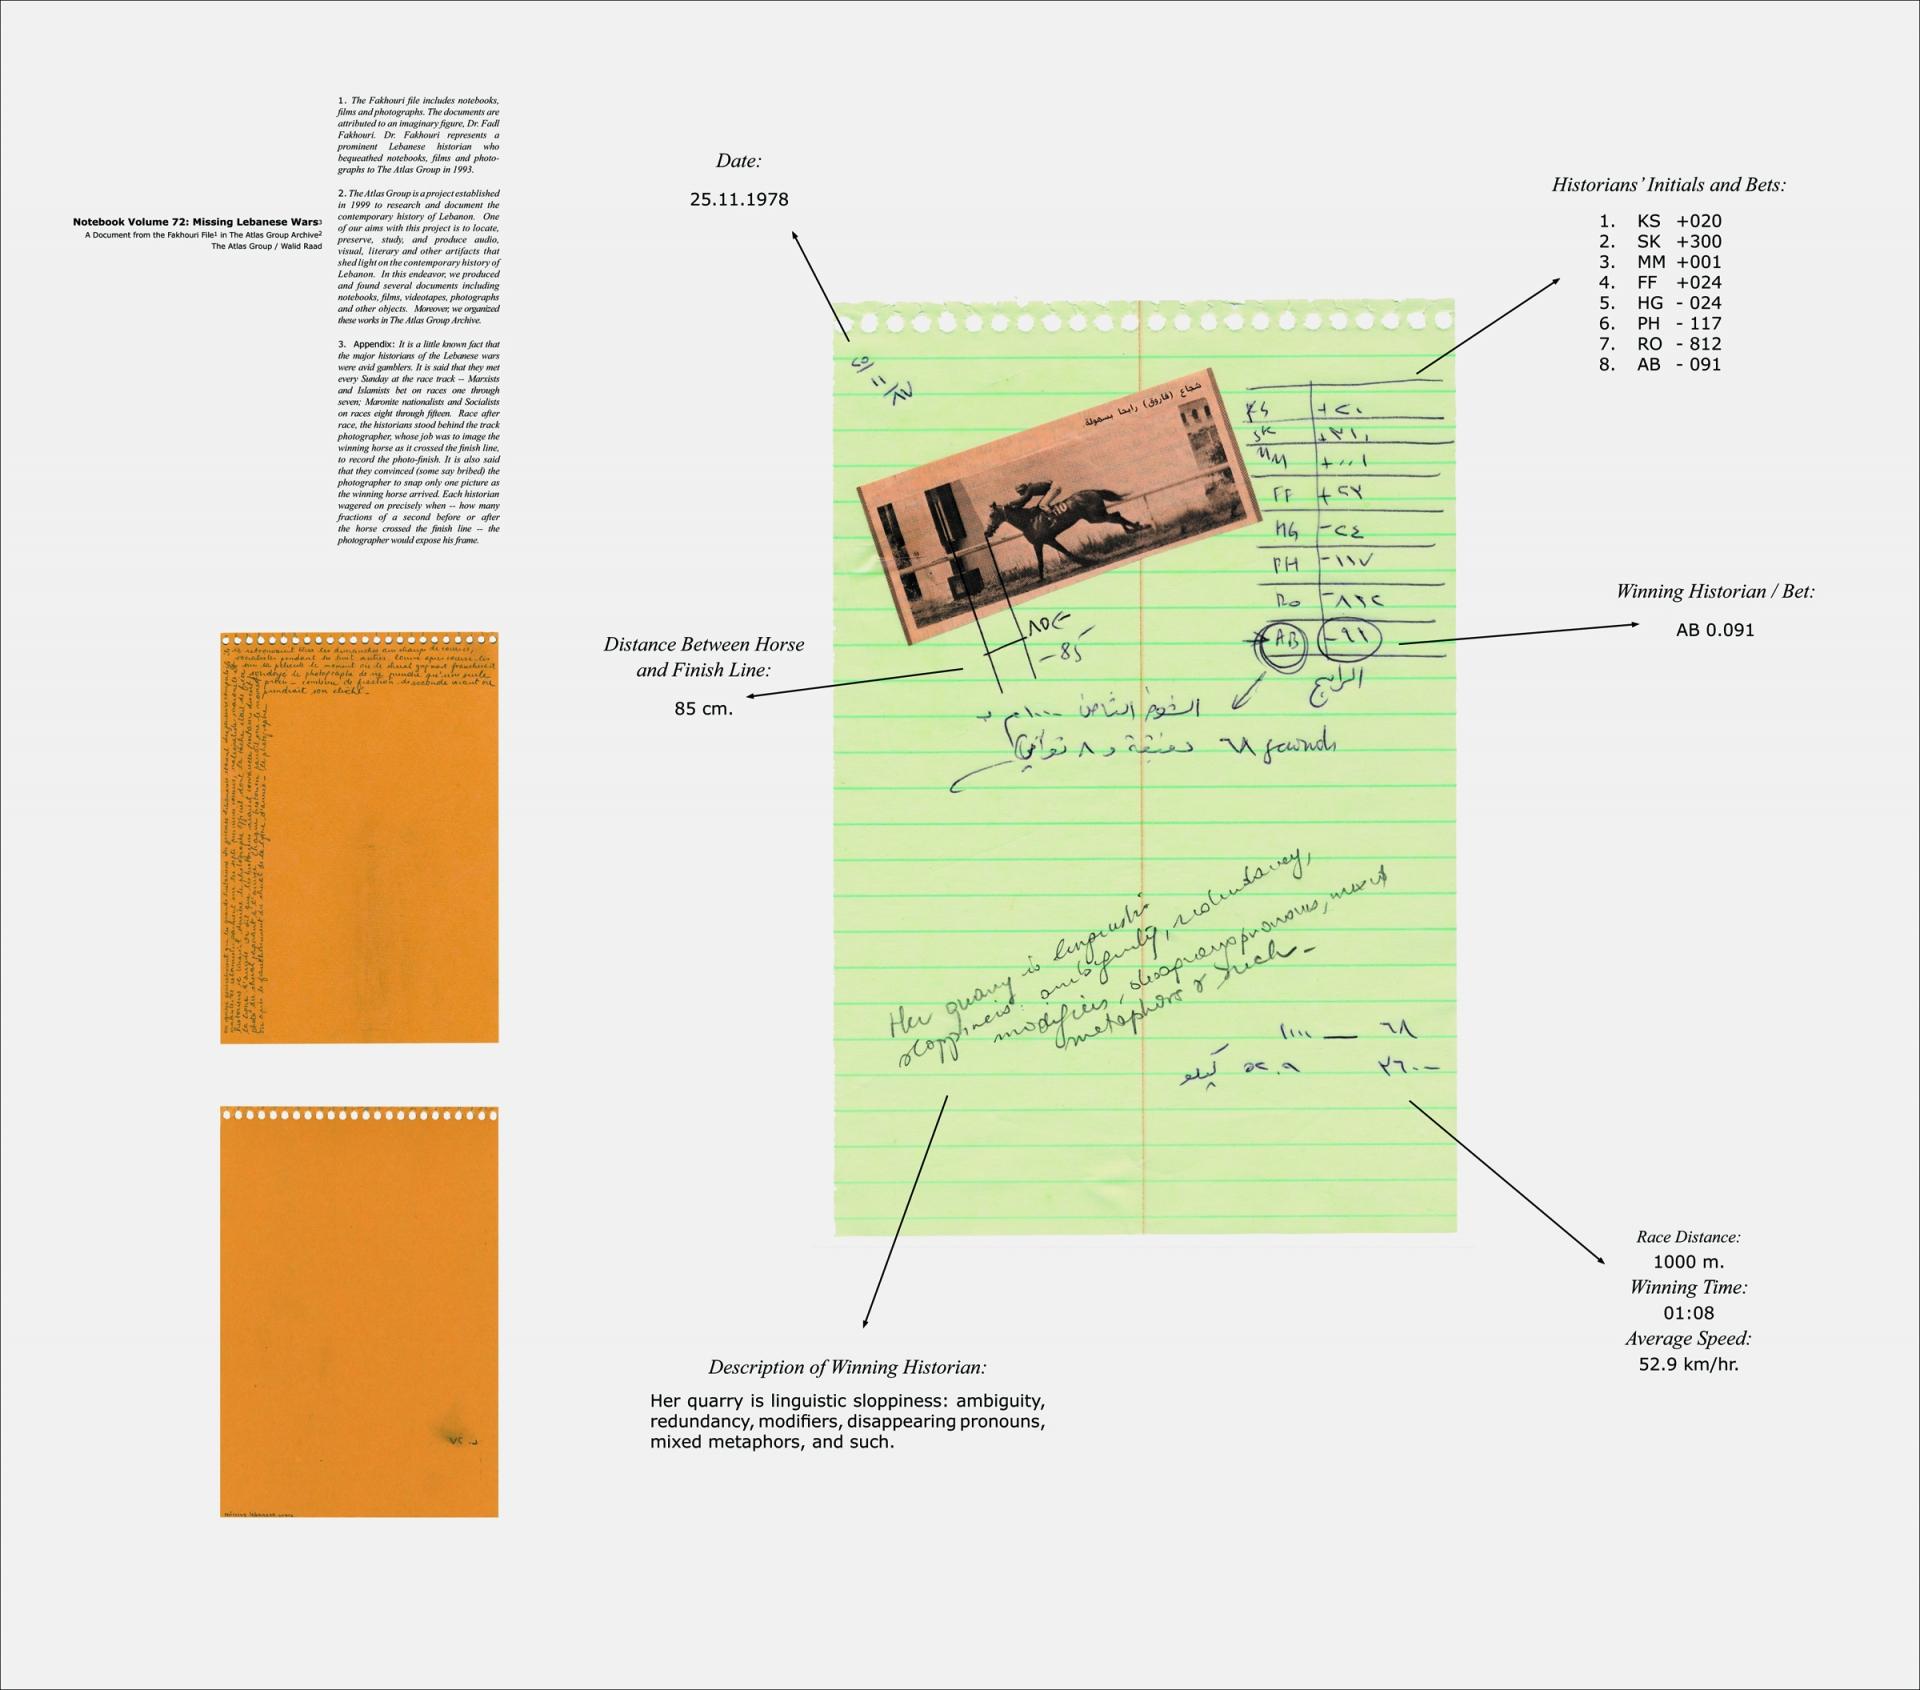 Notebook volume 72: Missing Lebanese Wars_The Linguist. 1989/1998, pigmented inkjet print, 112 x 127 cm